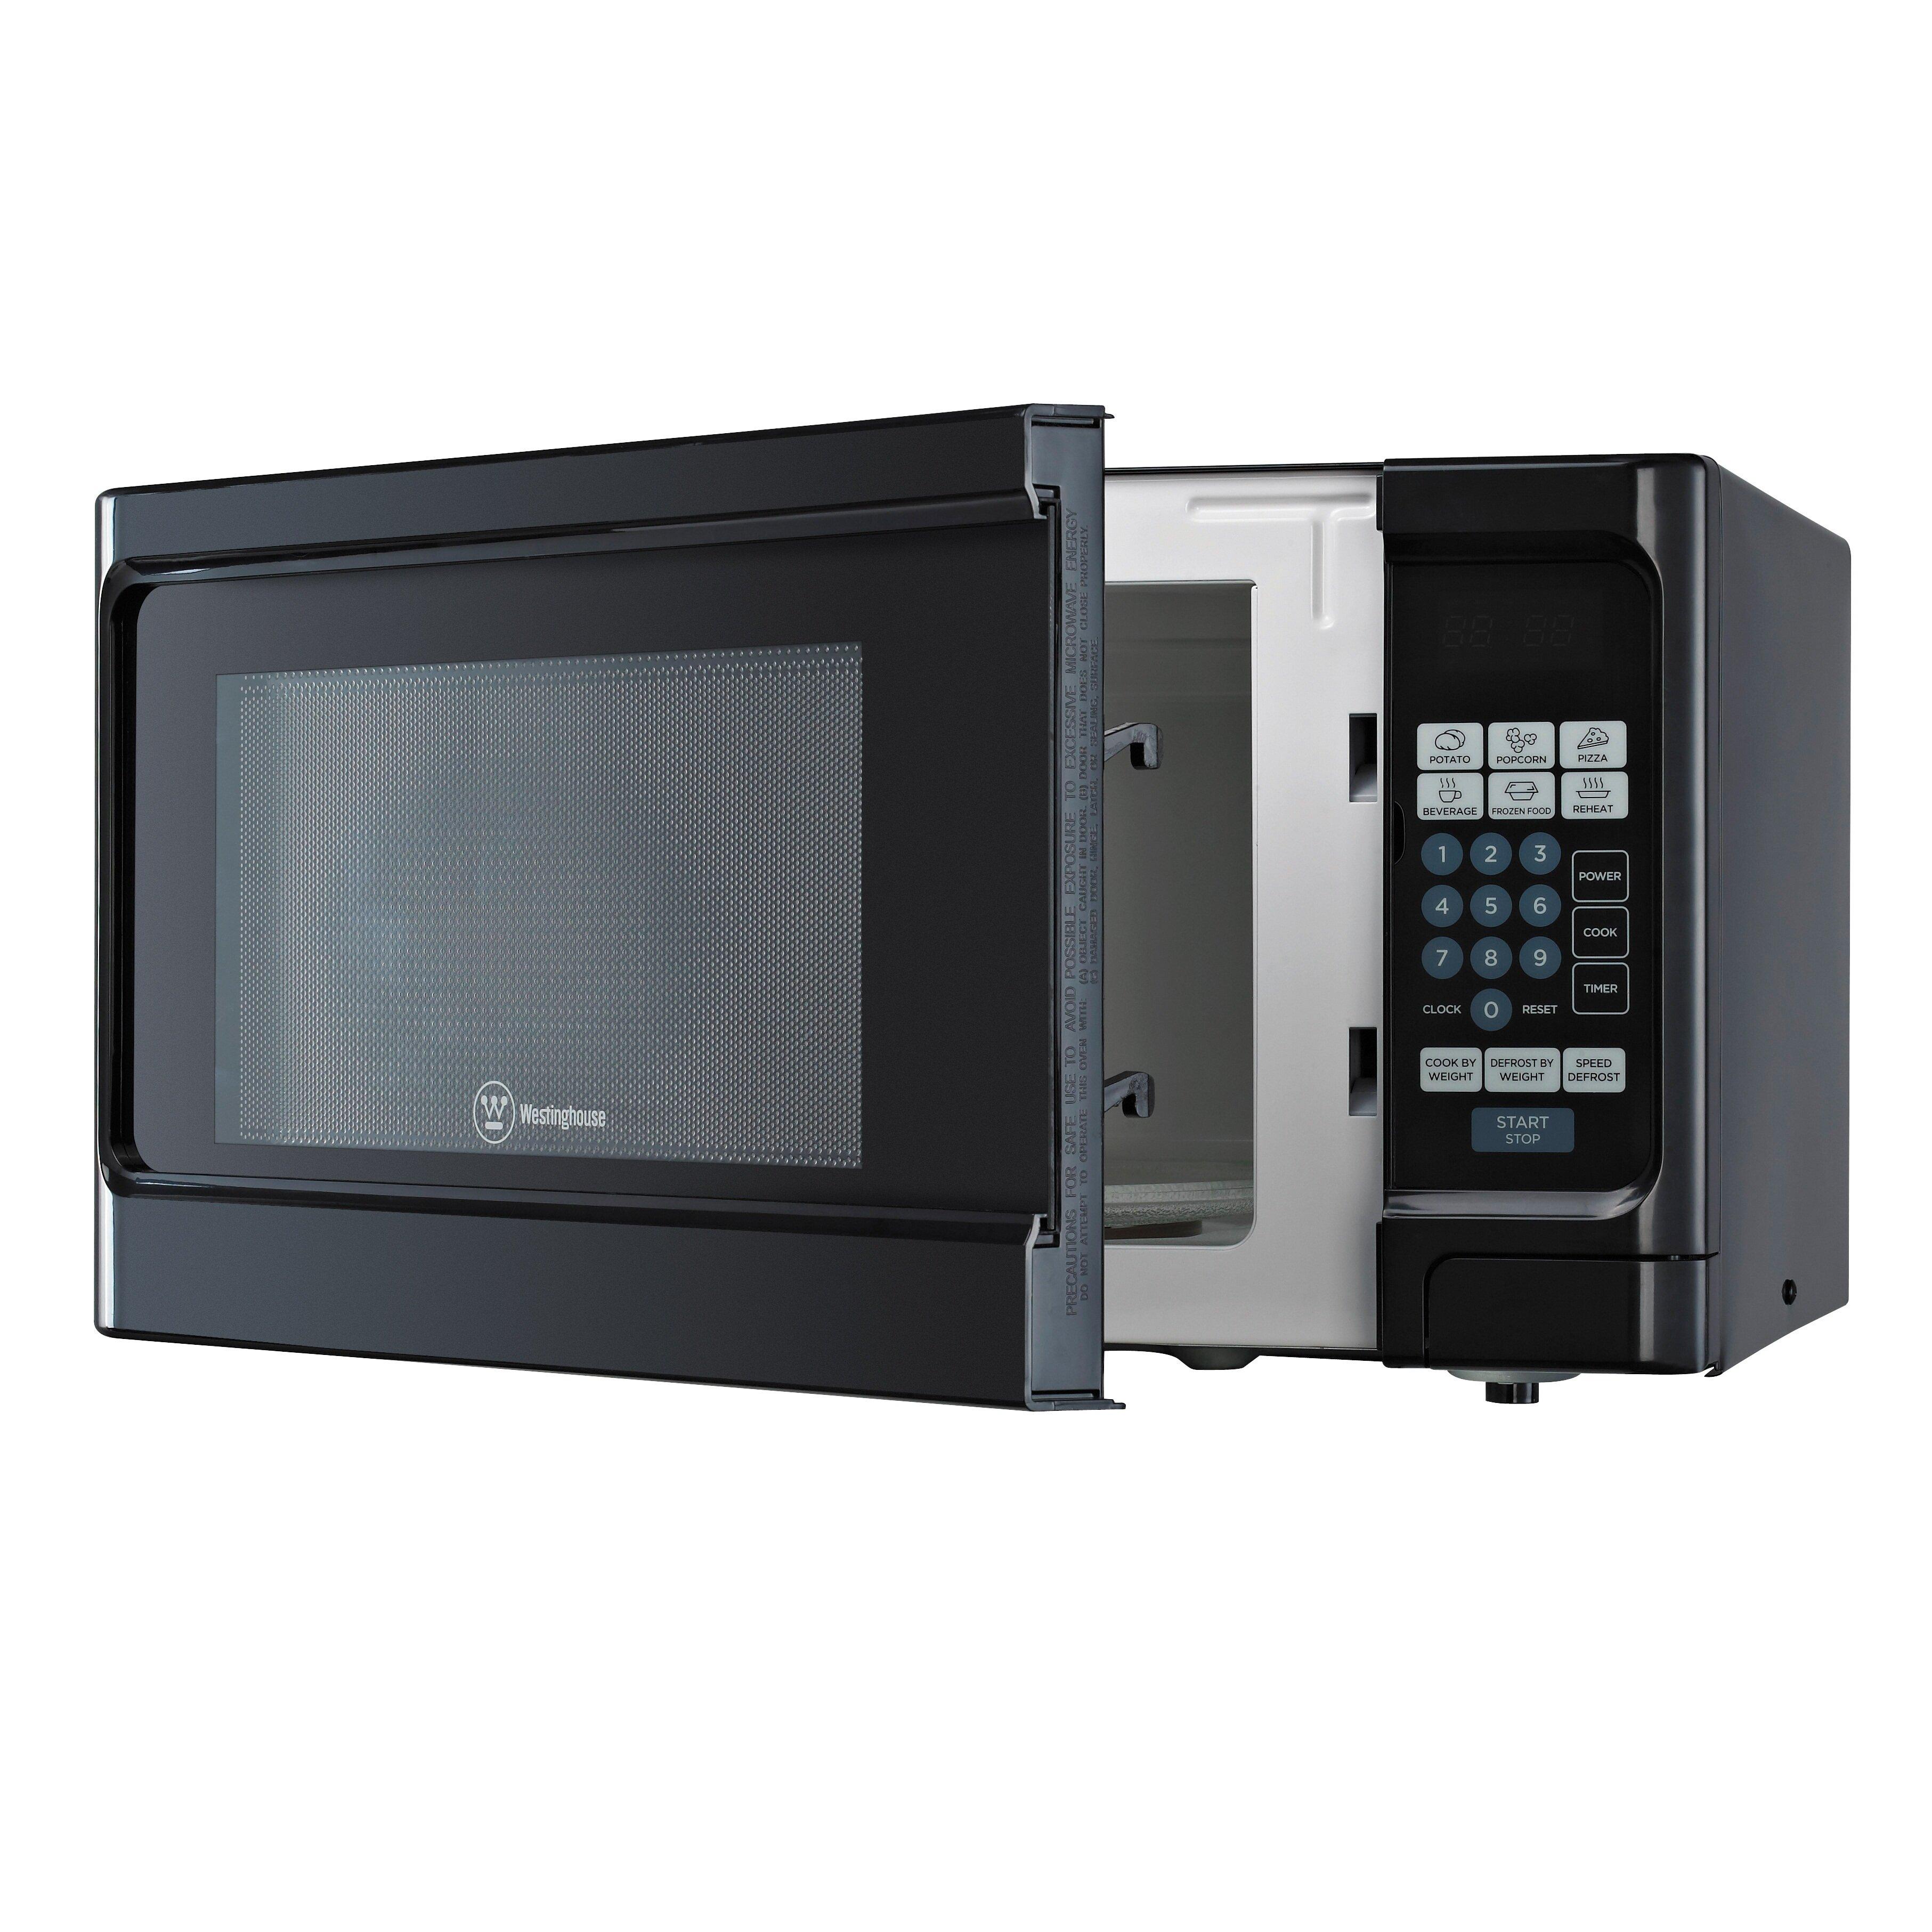 Countertop Microwave Stand : ... Cu. Ft. 1000W Countertop Microwave & Reviews Wayfair